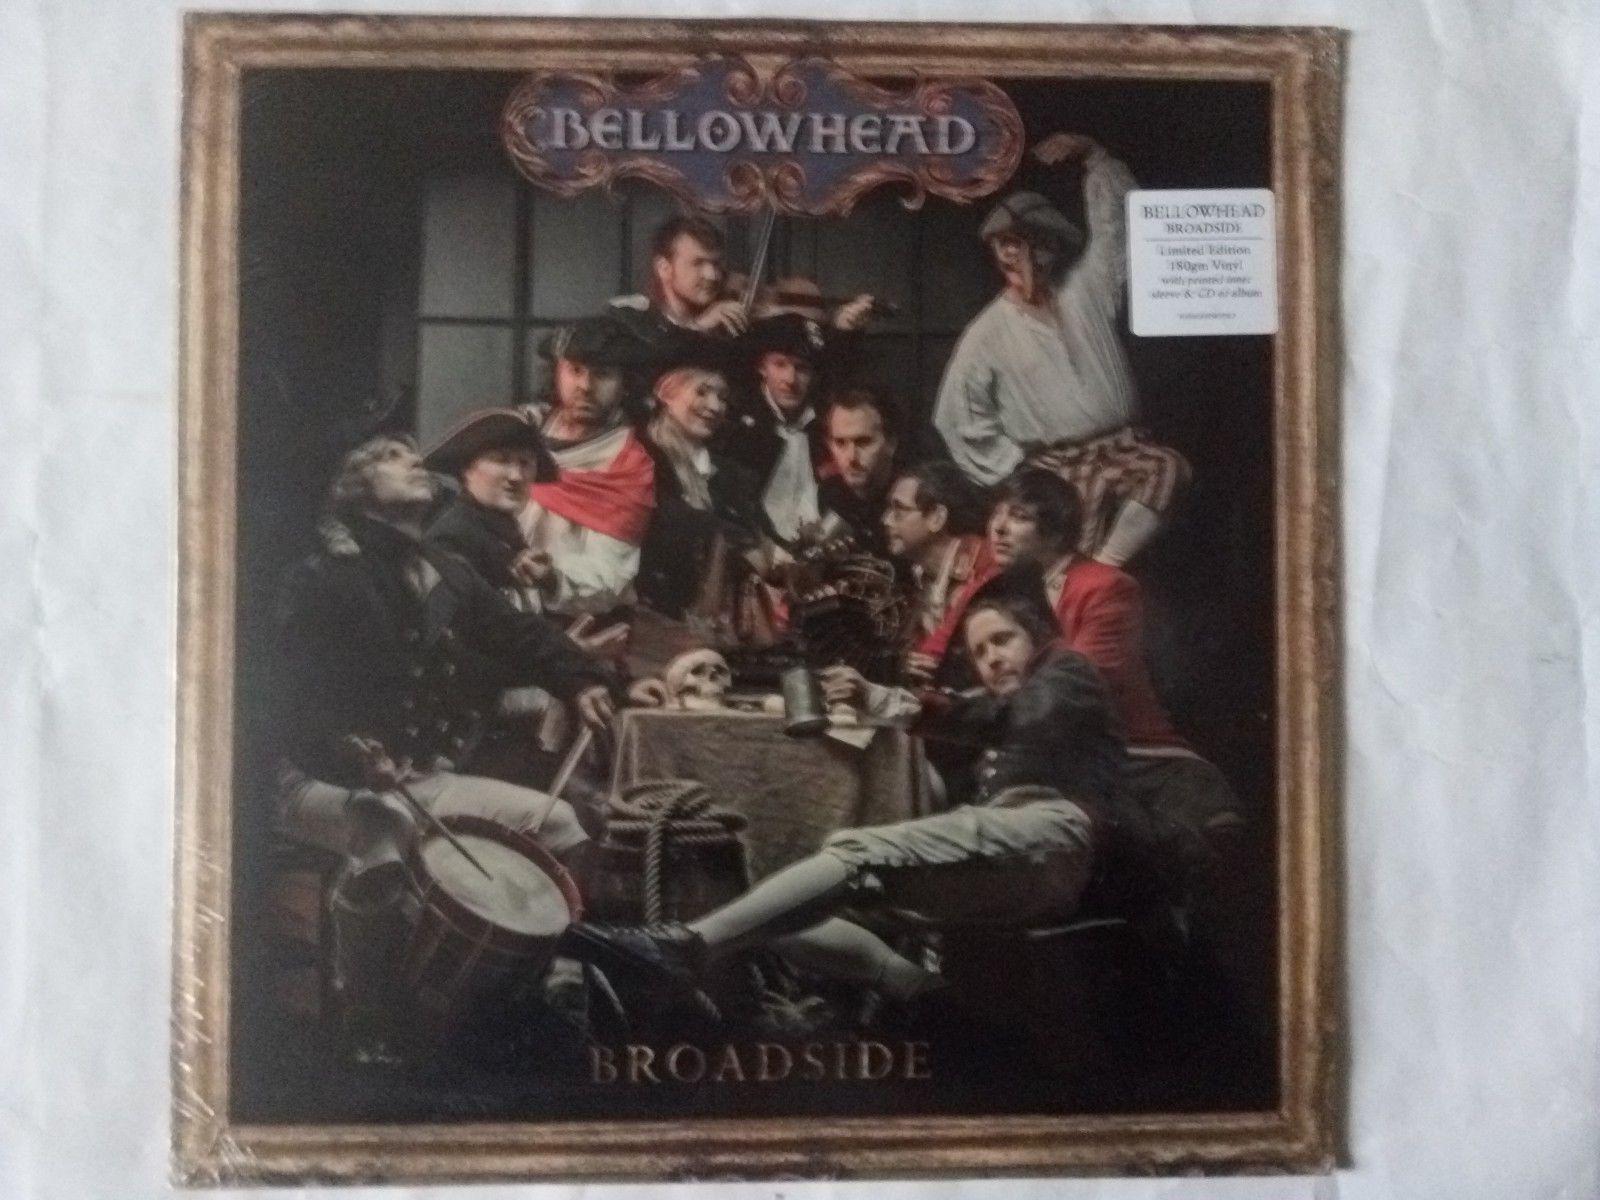 BELLOWHEAD BROADSIDE NEW S/S 180GM LP S/S P/S & CD NAVIGATOR073LP 2012  FOLK